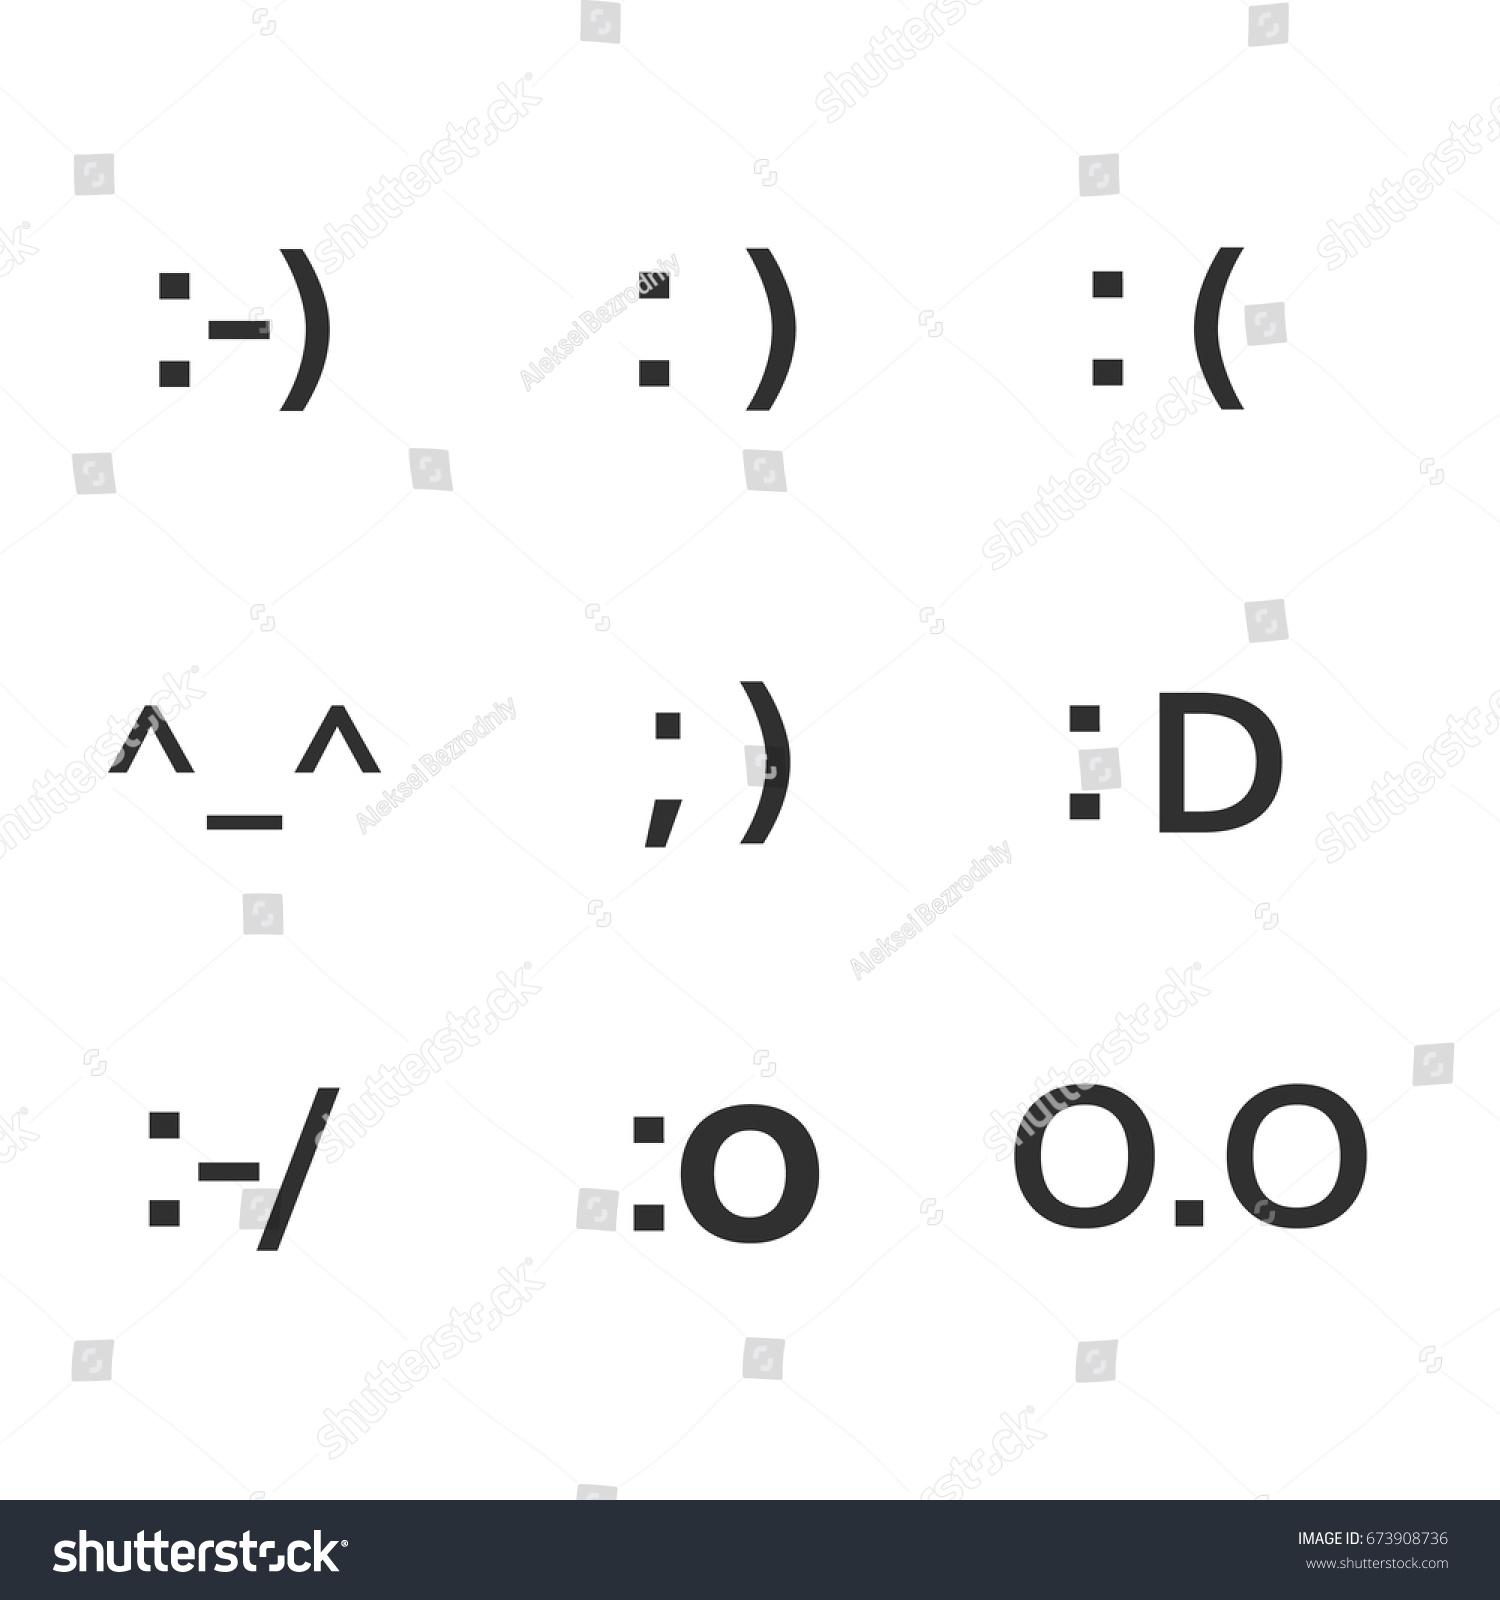 Emoji faces keyboard symbols smile symbols stock vector 673908736 emoji faces keyboard symbols smile symbols smiley faces set biocorpaavc Images